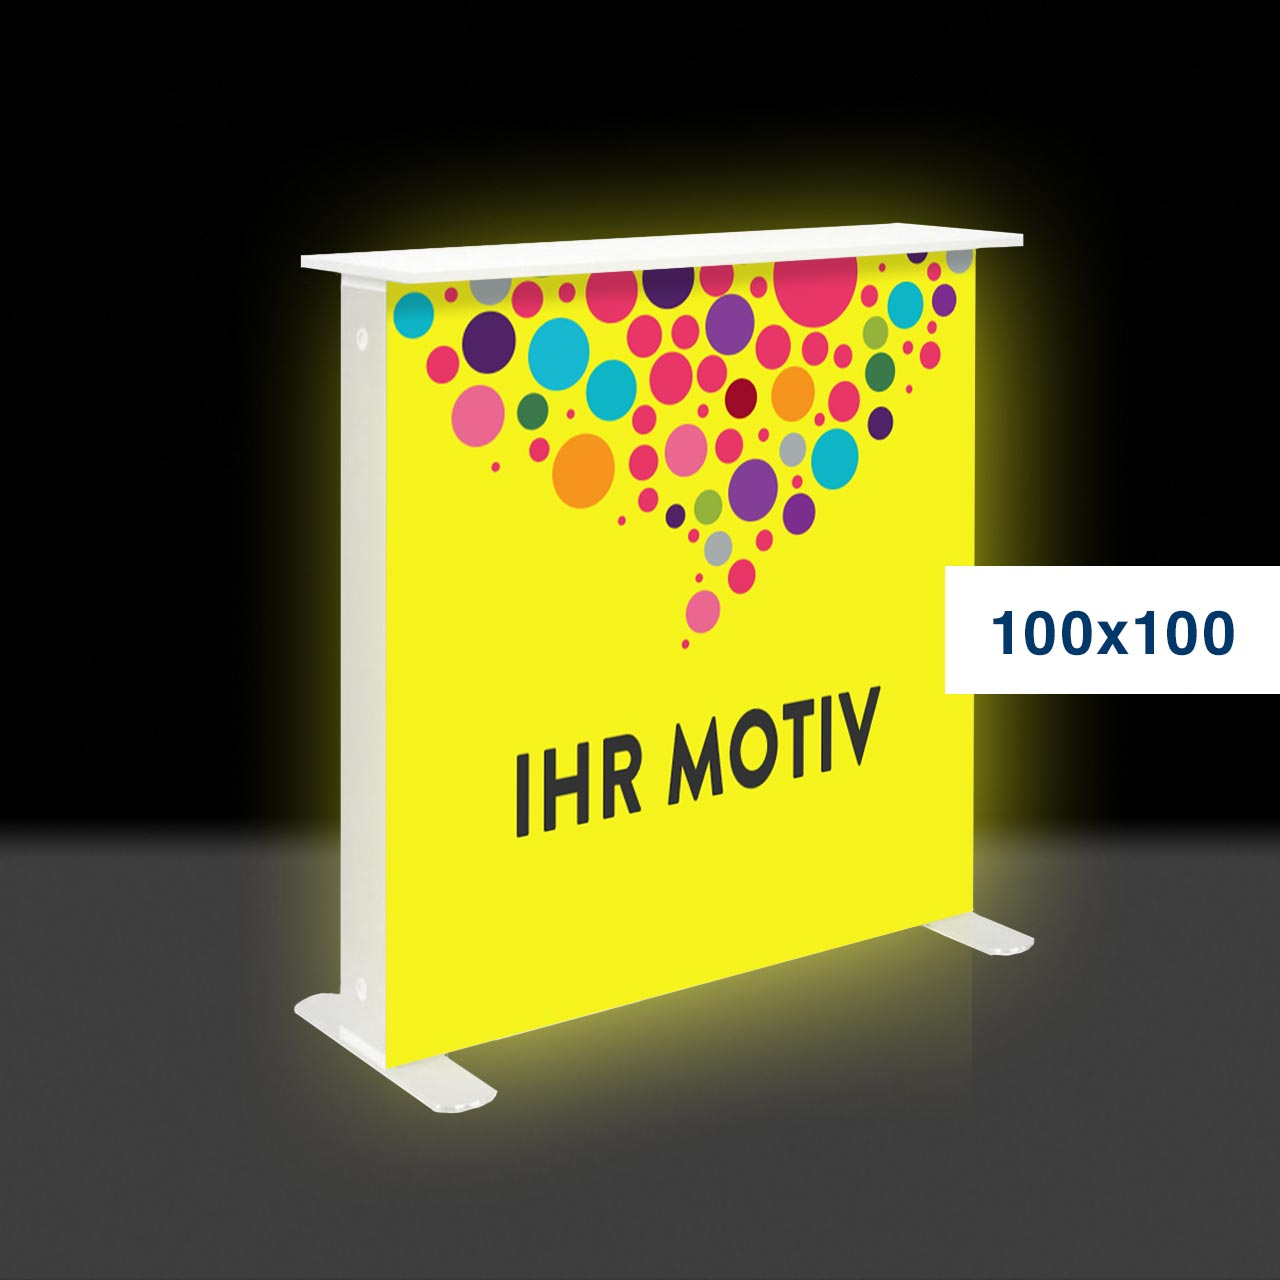 Die leuchtende mobile Messetheke – Mobile Light Box 100x100 Counter